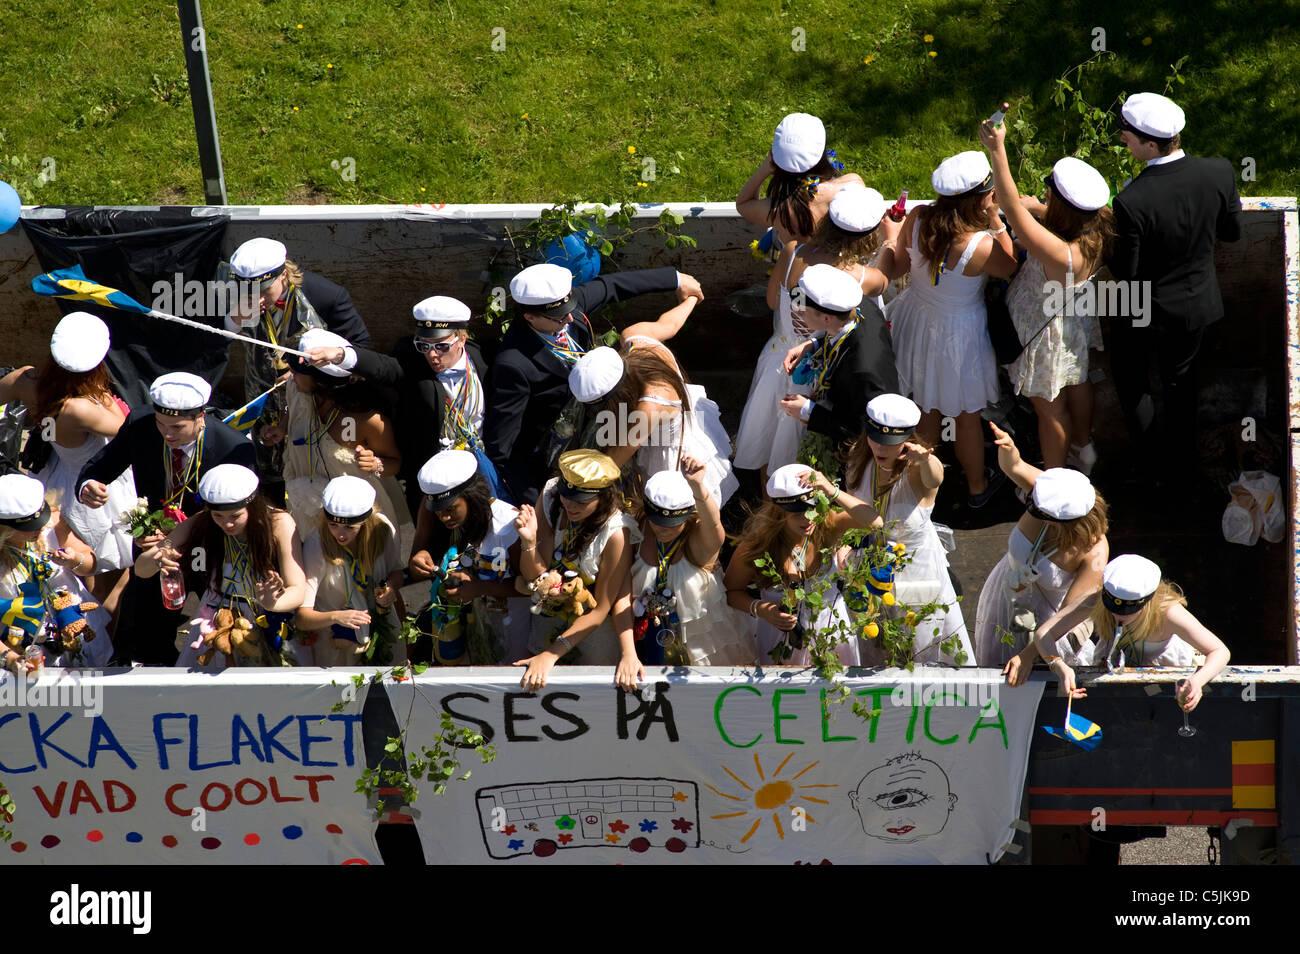 Student celebration in Sweden - Stock Image